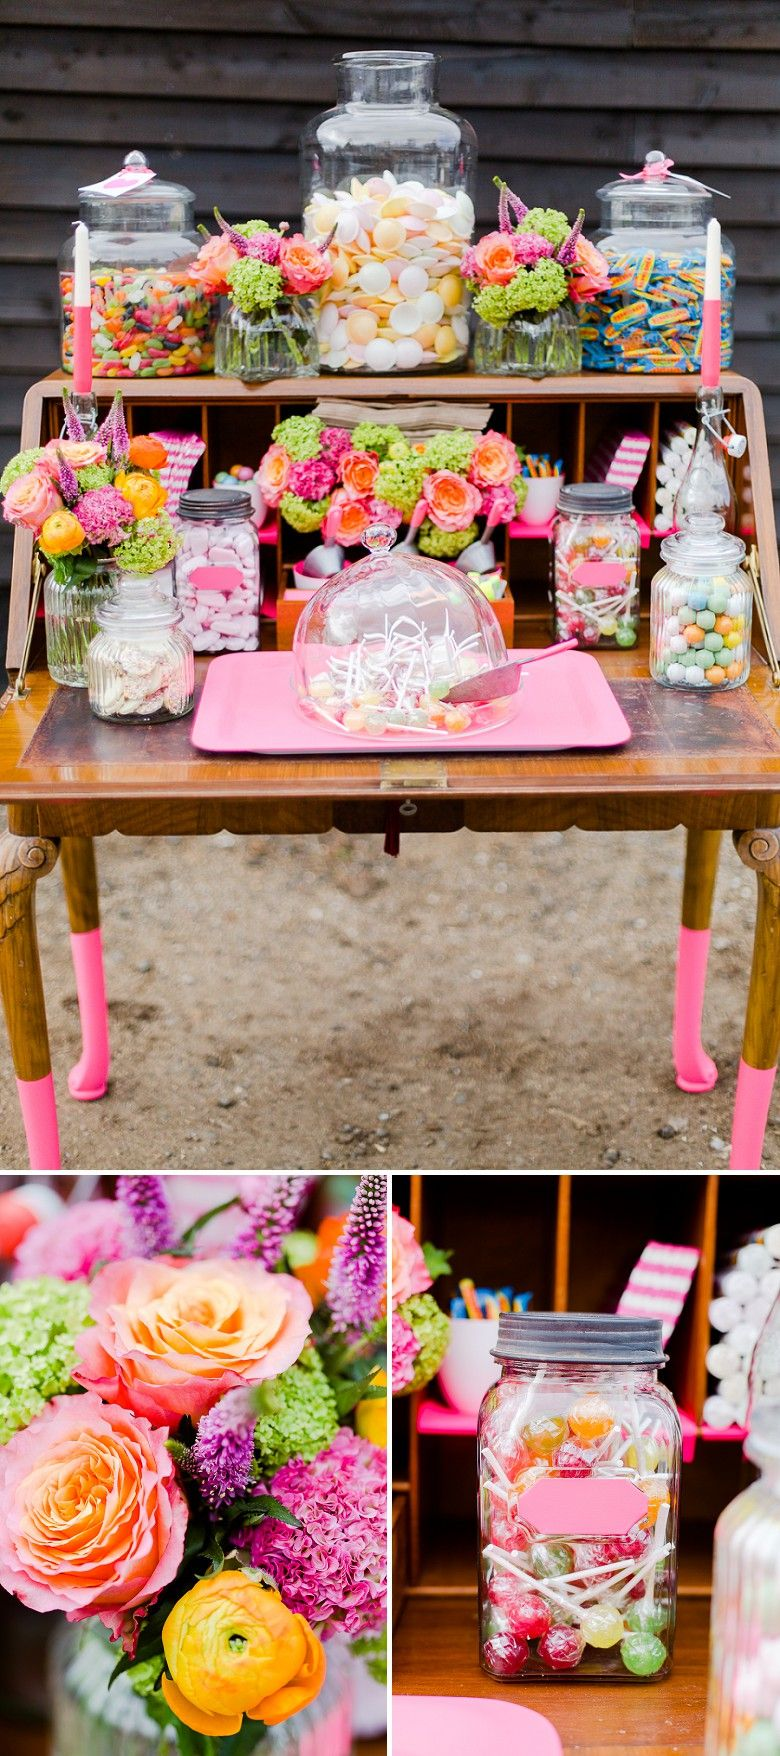 Alternative Wedding Catering Ideas With Kalm Kitchen